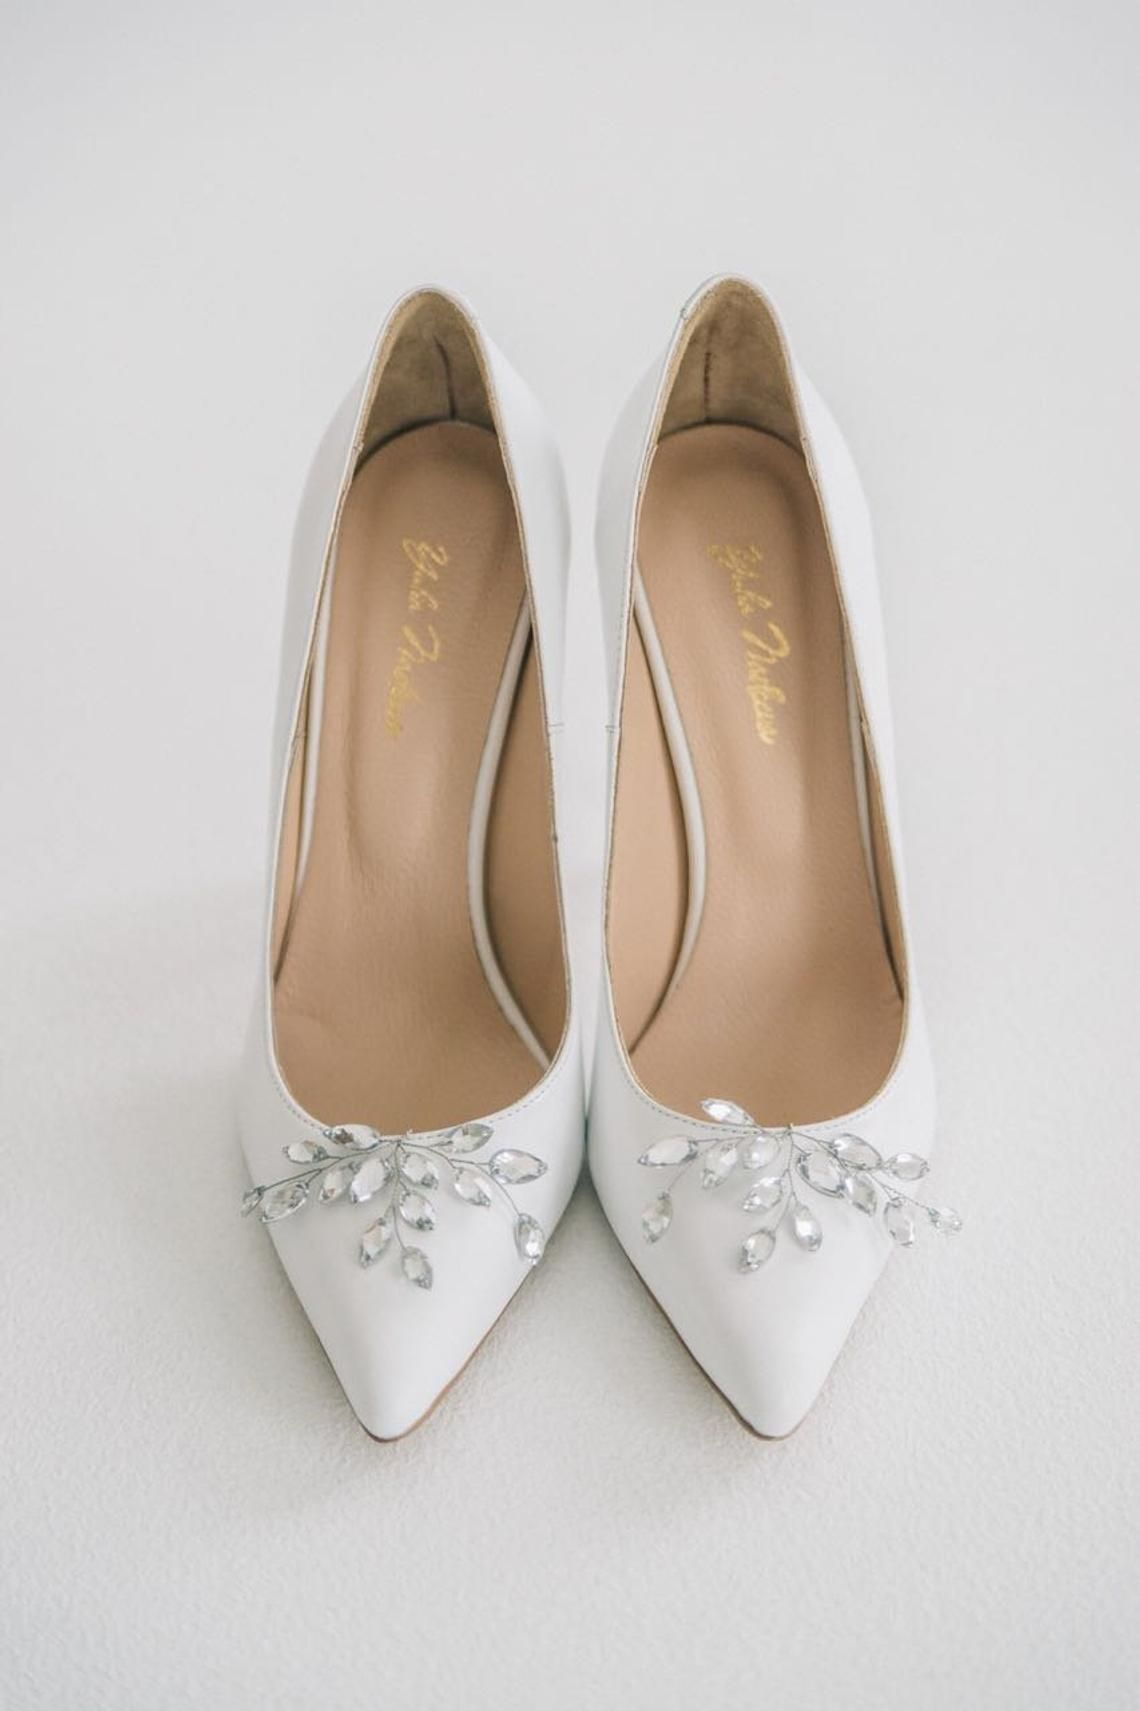 Wedding Shoes White Wedding Shoes Bridal Shoes Wedding Heels